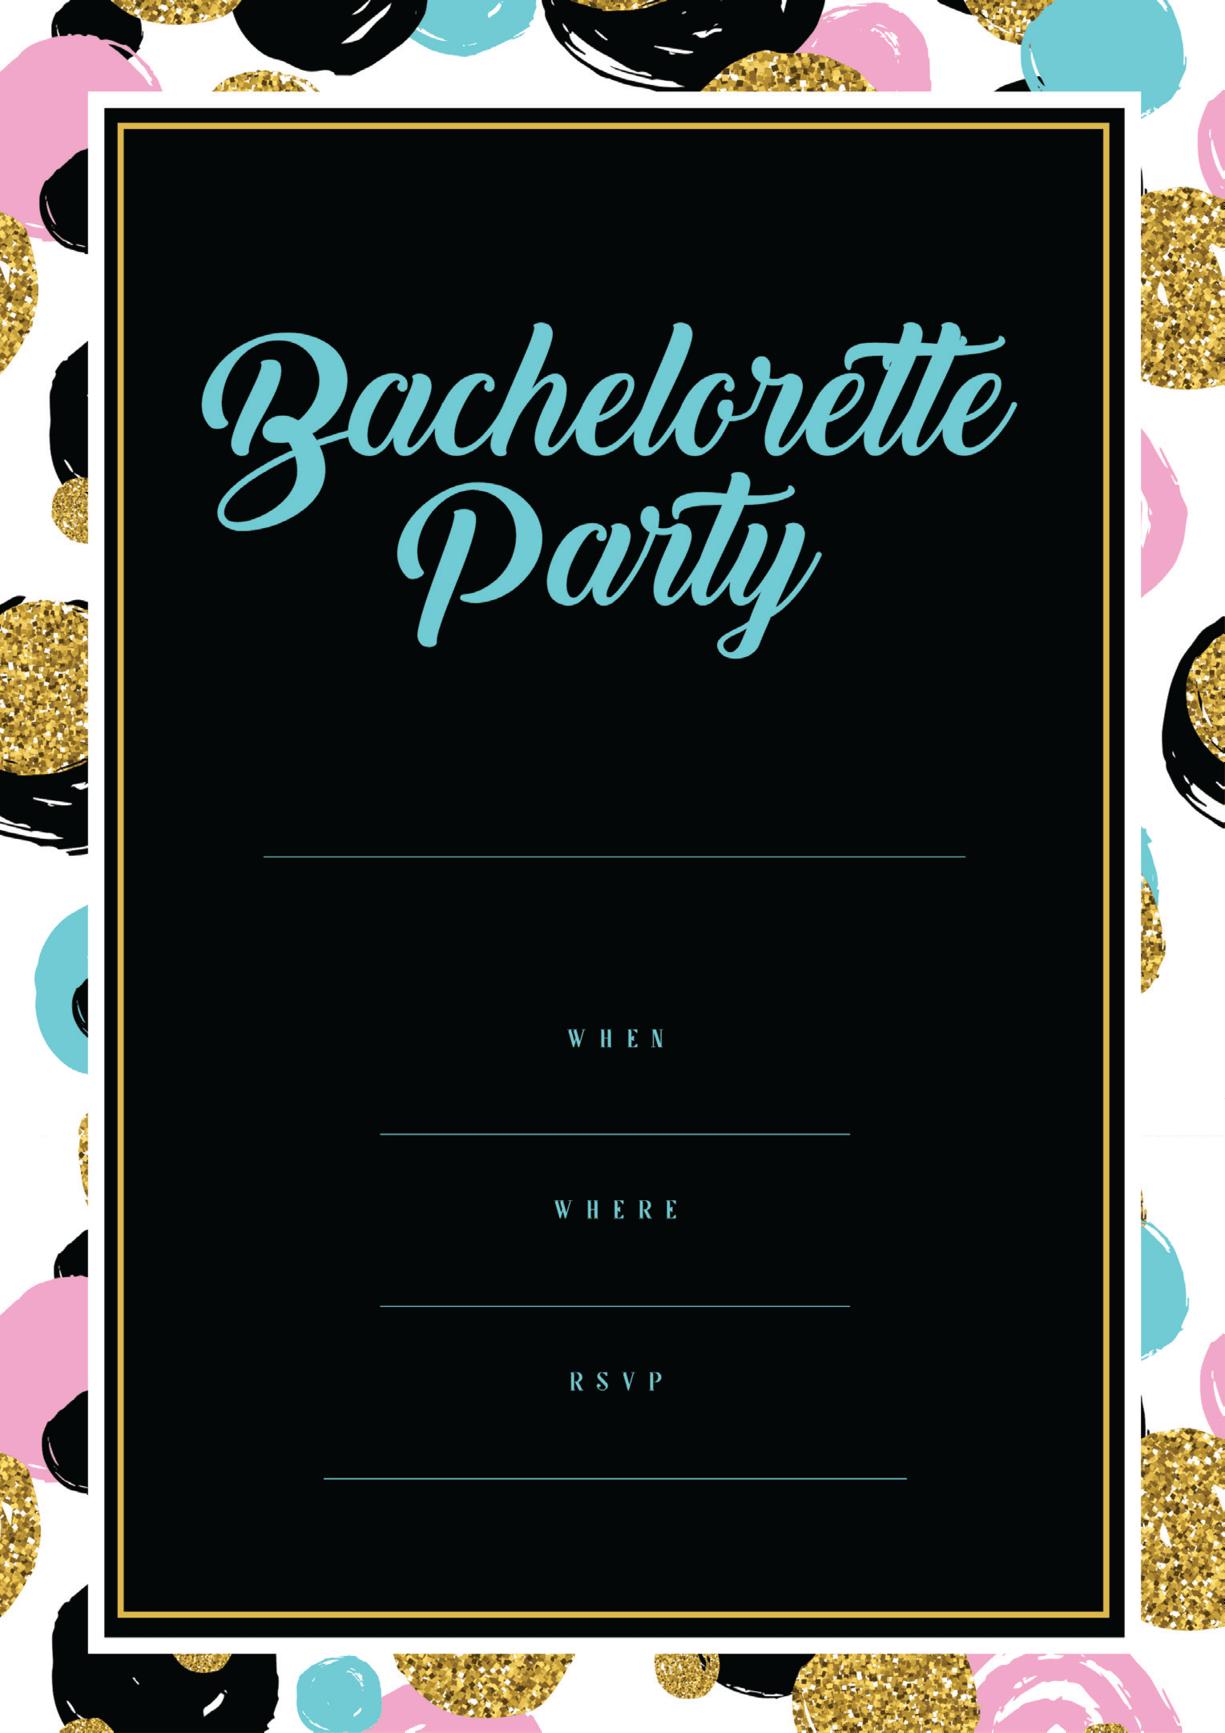 black bachelorette party invitation with palette border